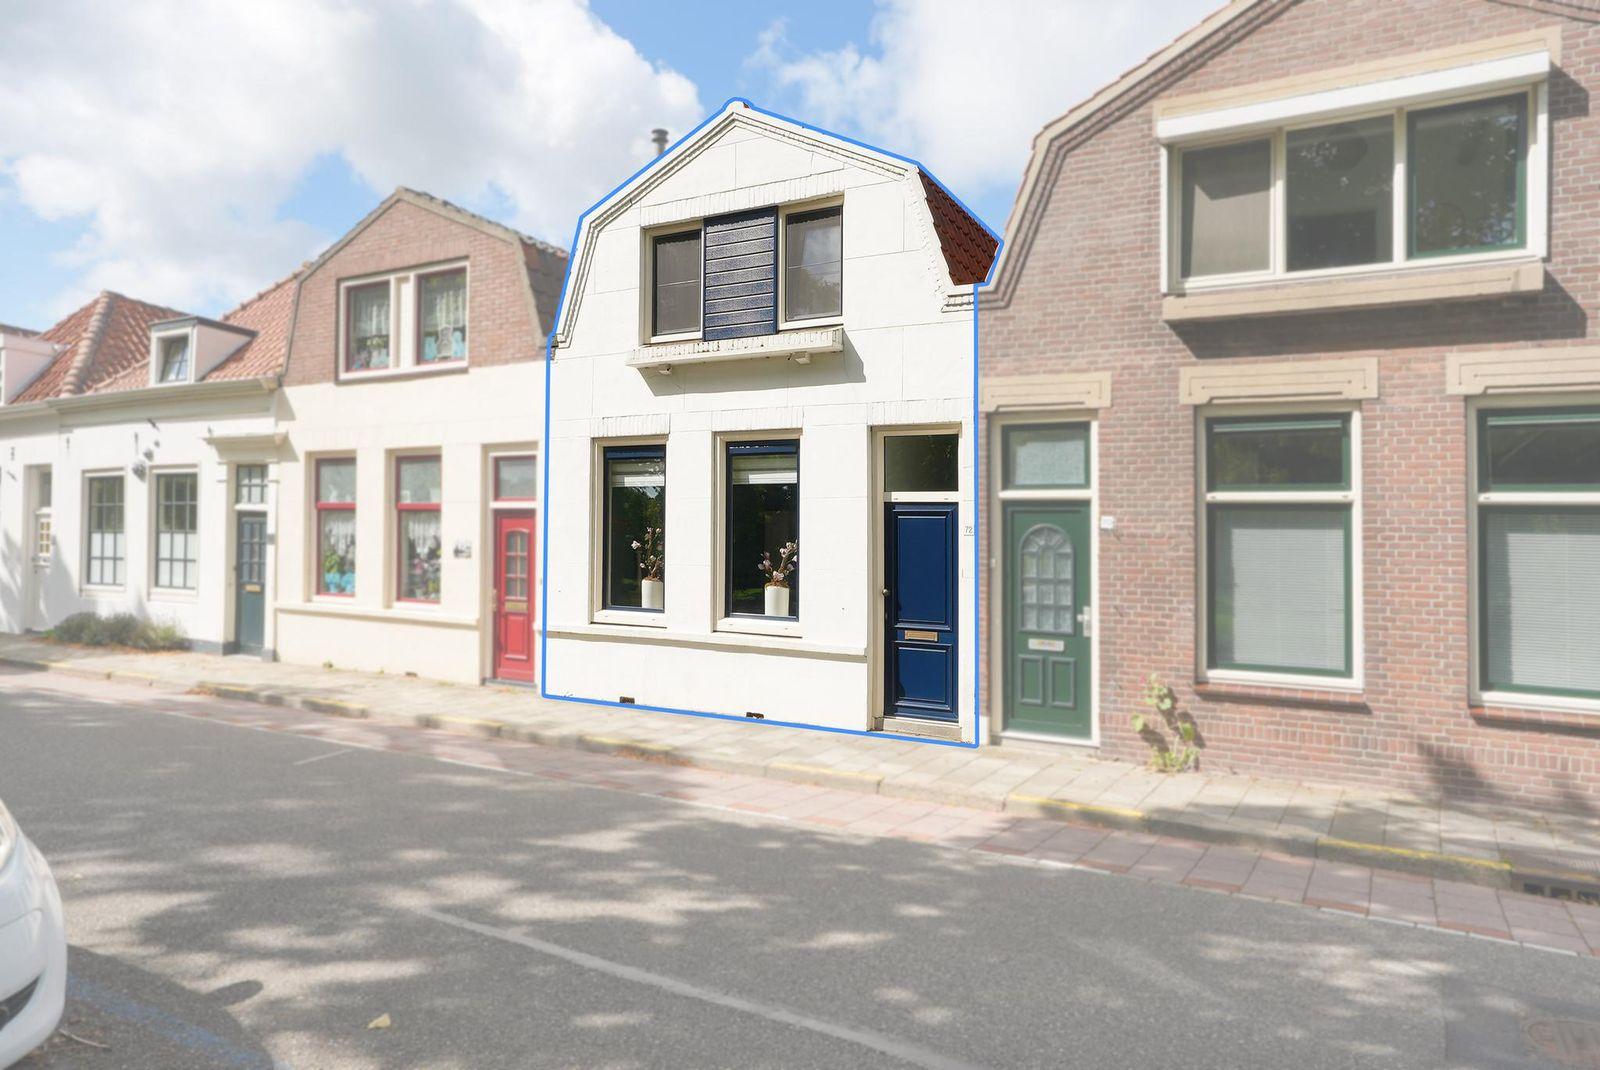 Seissingel 72, Middelburg